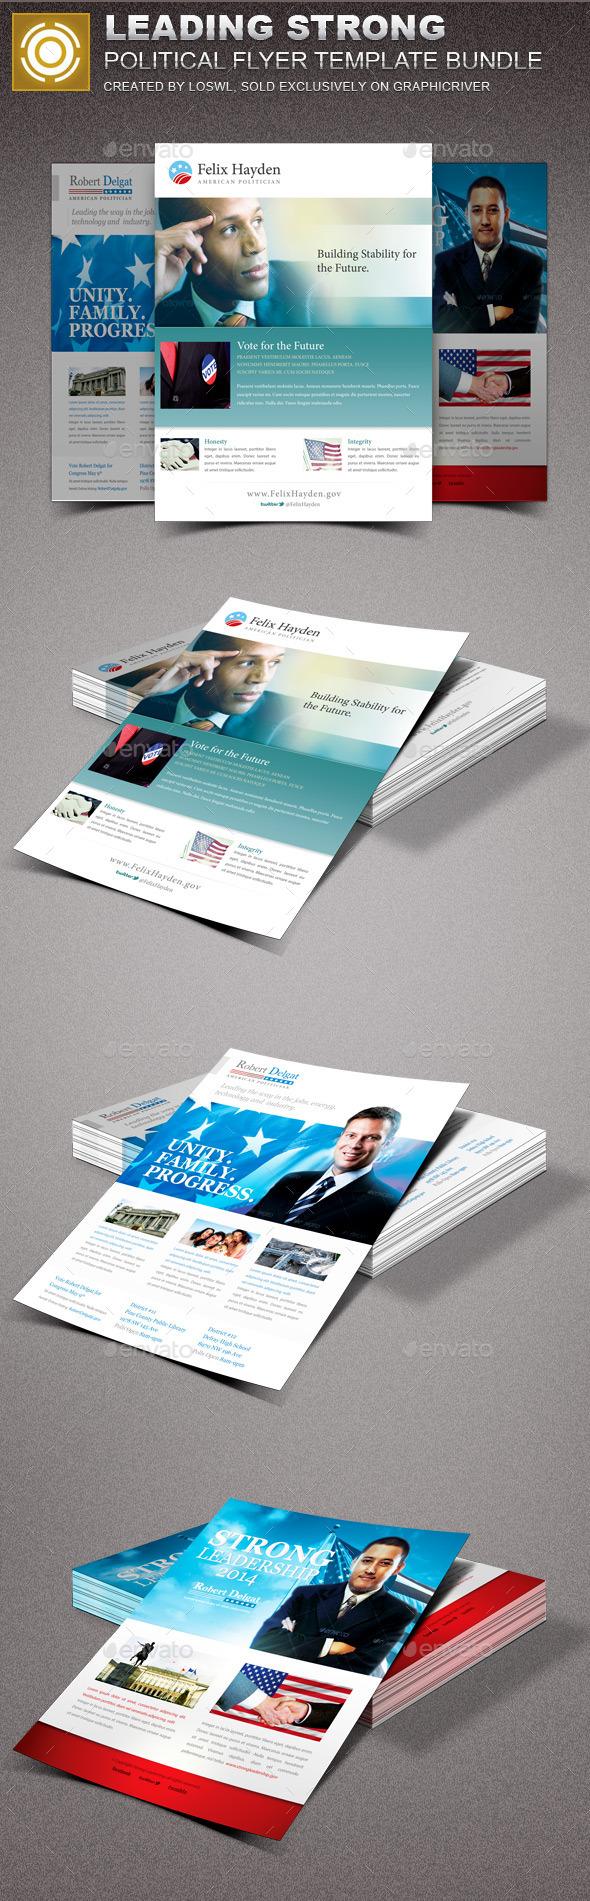 Re election graphics designs templates from graphicriver colourmoves